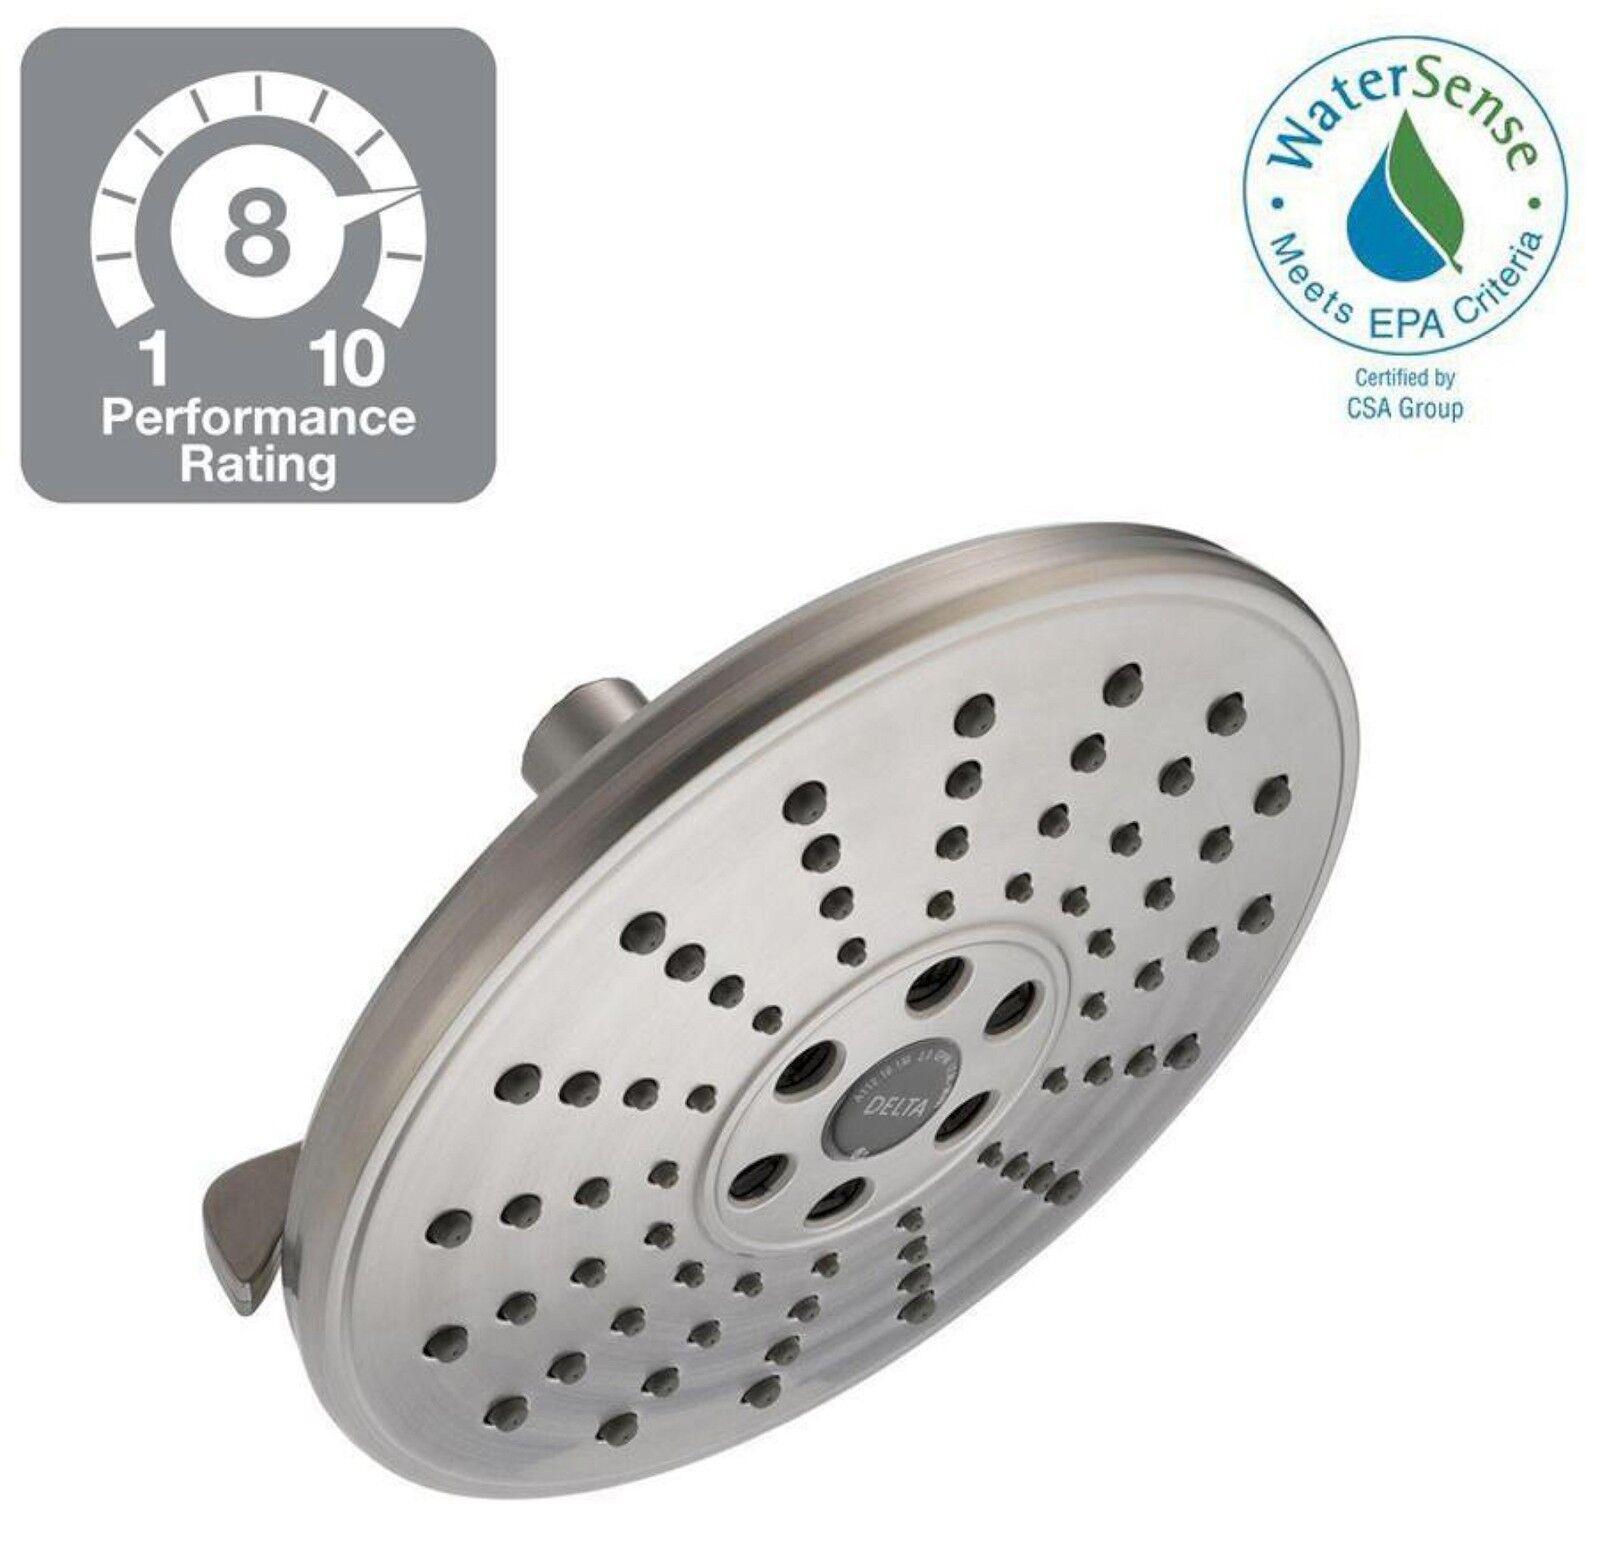 New Delta H2okinetic 3 Spray Shower Head Brushed Nickel Massage Watersense Clean